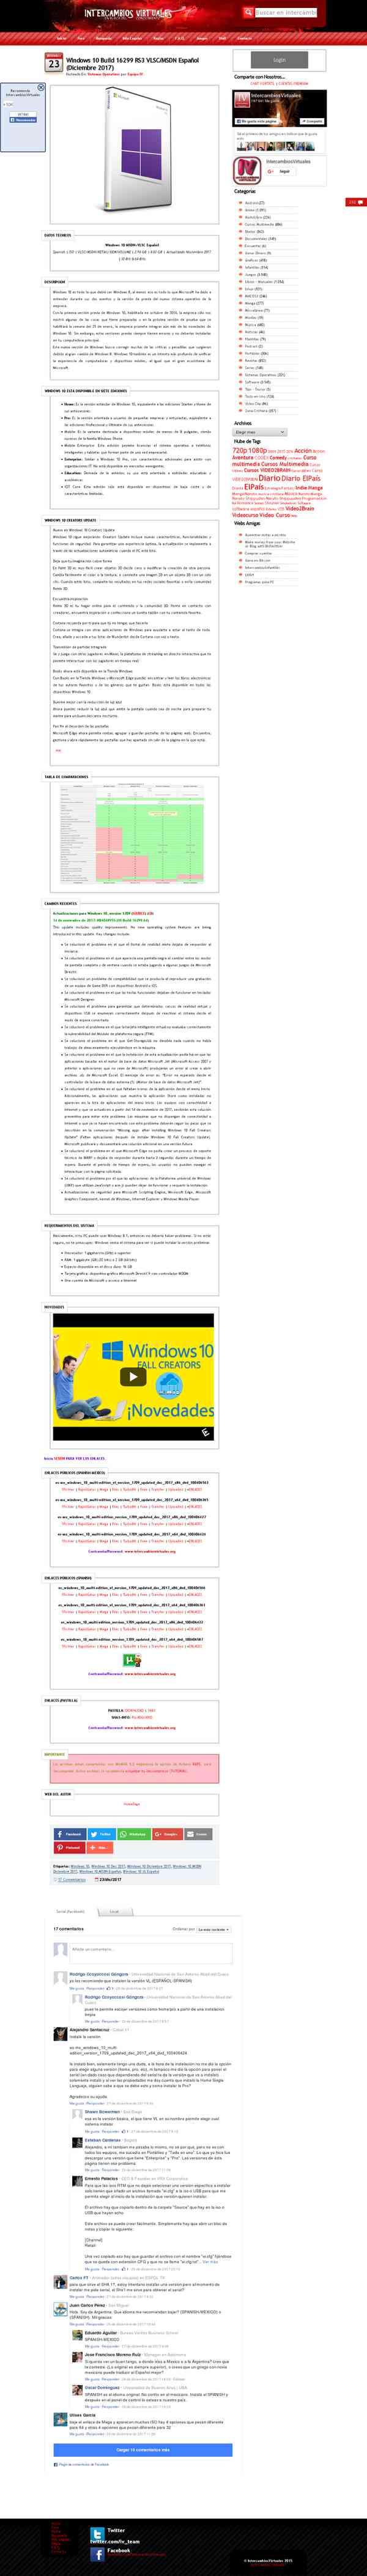 windows 8.1 2017 intercambiosvirtuales